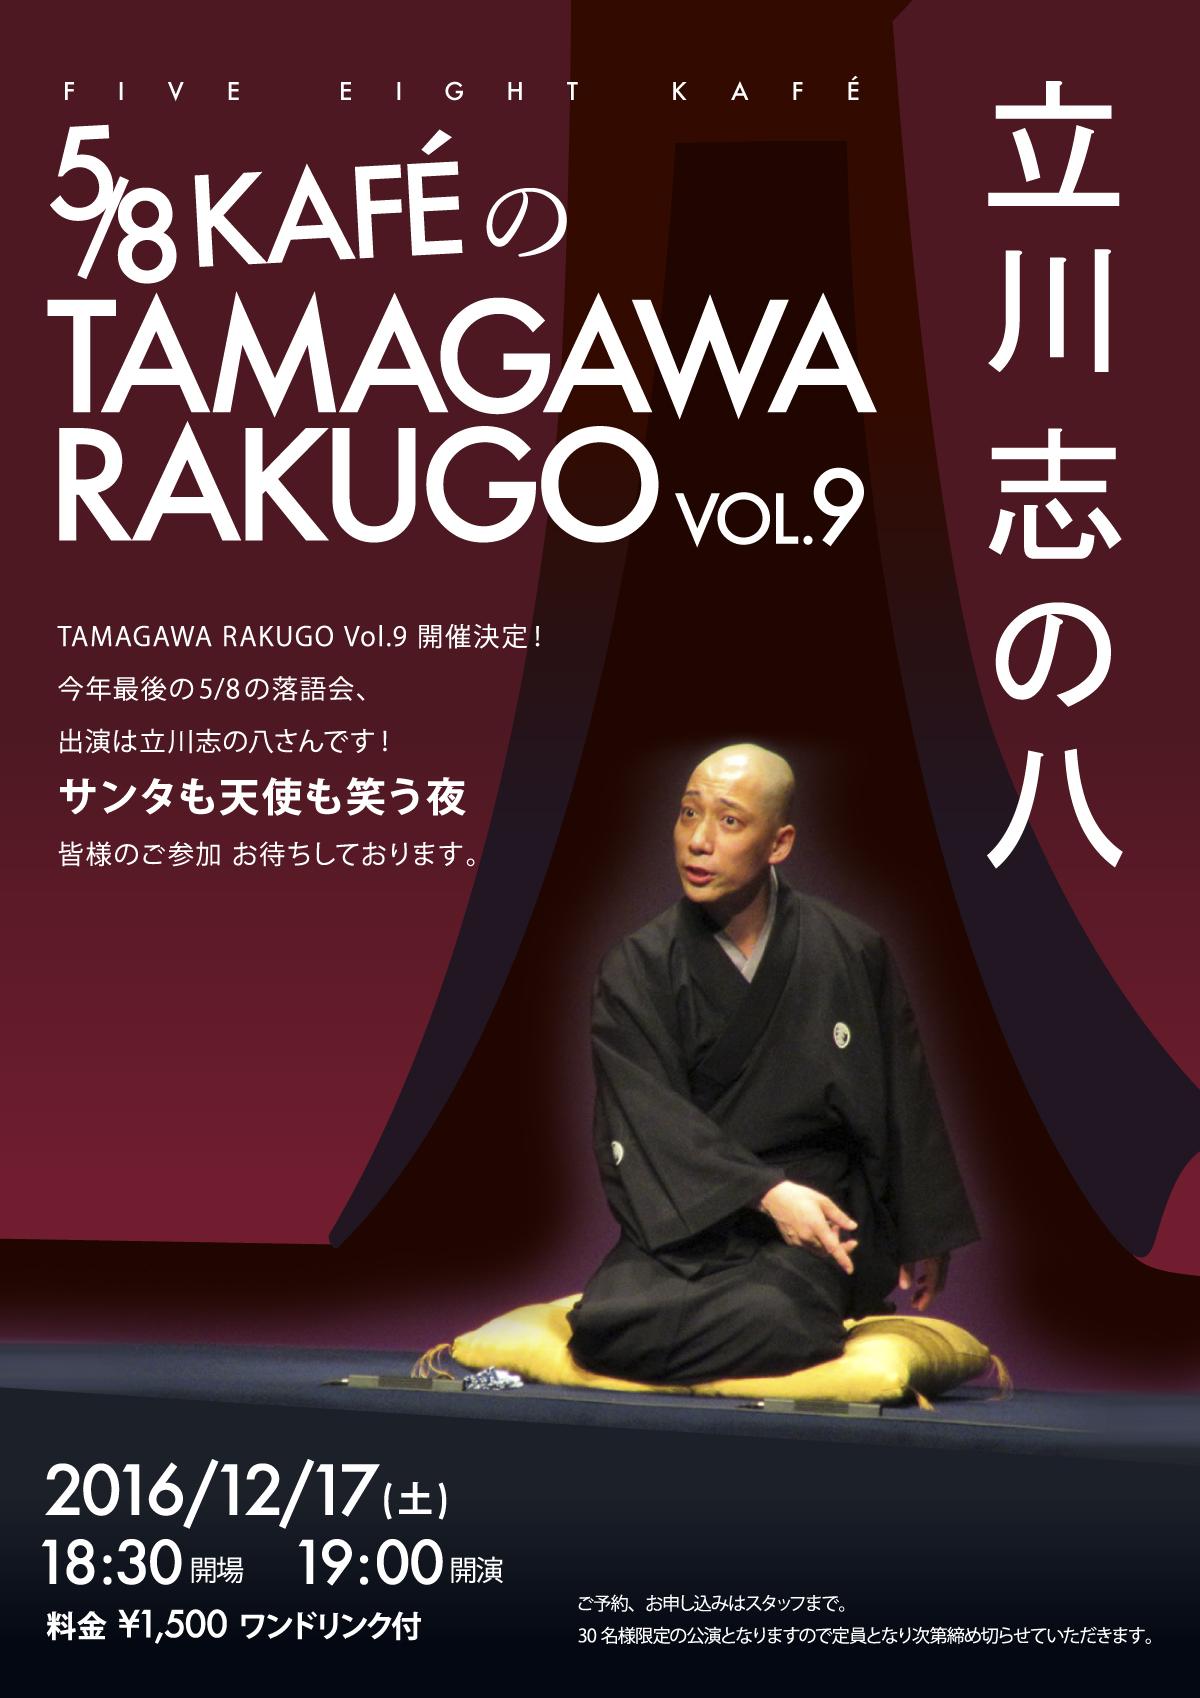 TAMAGAWA RAKUGOvol.9